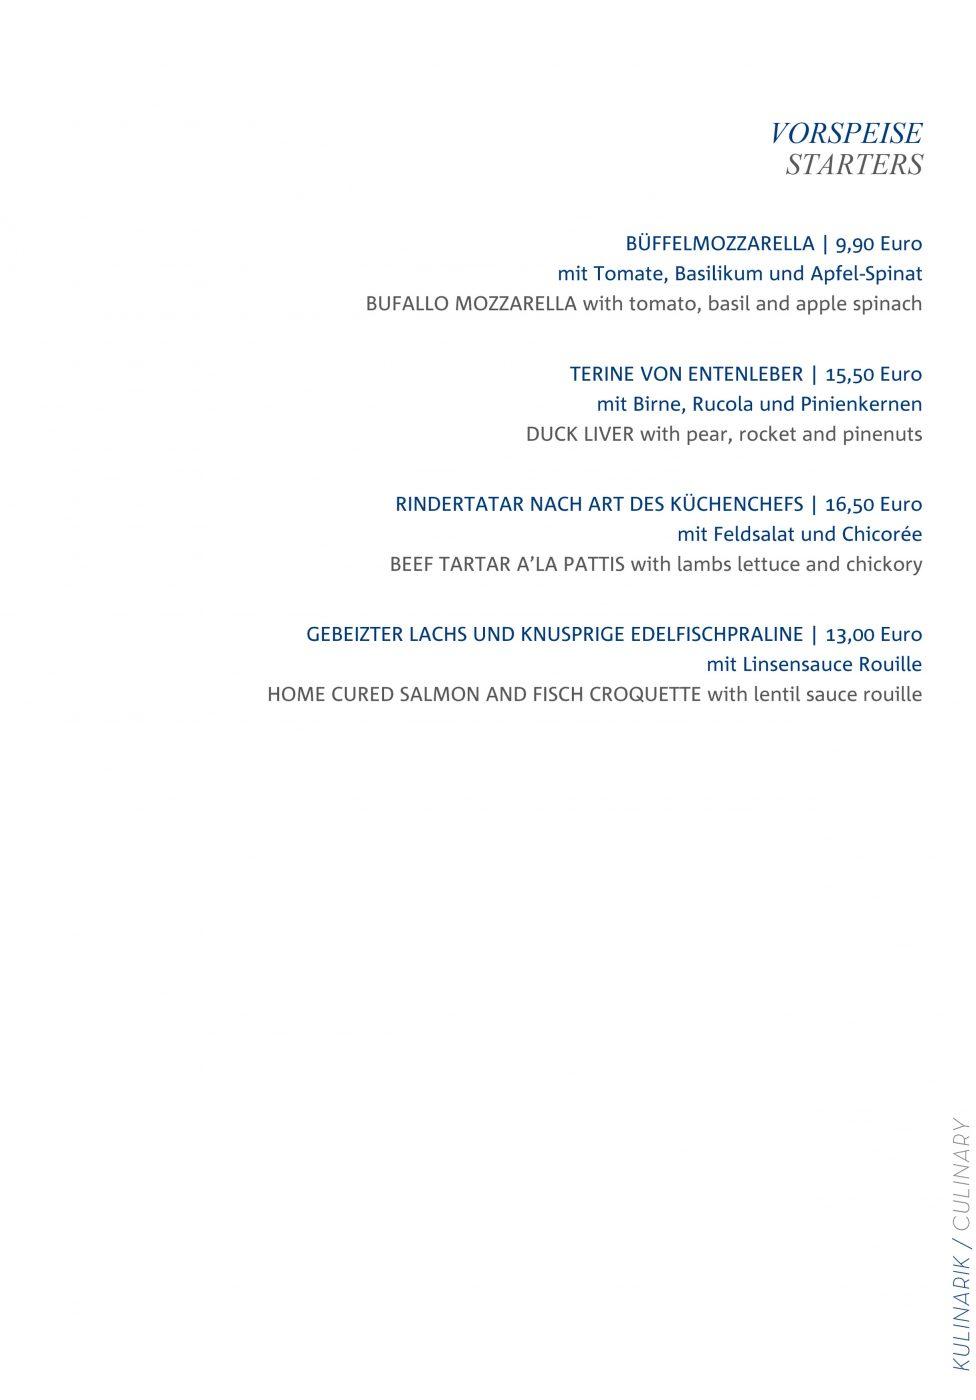 https://www.vitrum-dresden.de/wp-content/uploads/2019/03/1_Kulinarik_Februar_1-976x1400.jpg